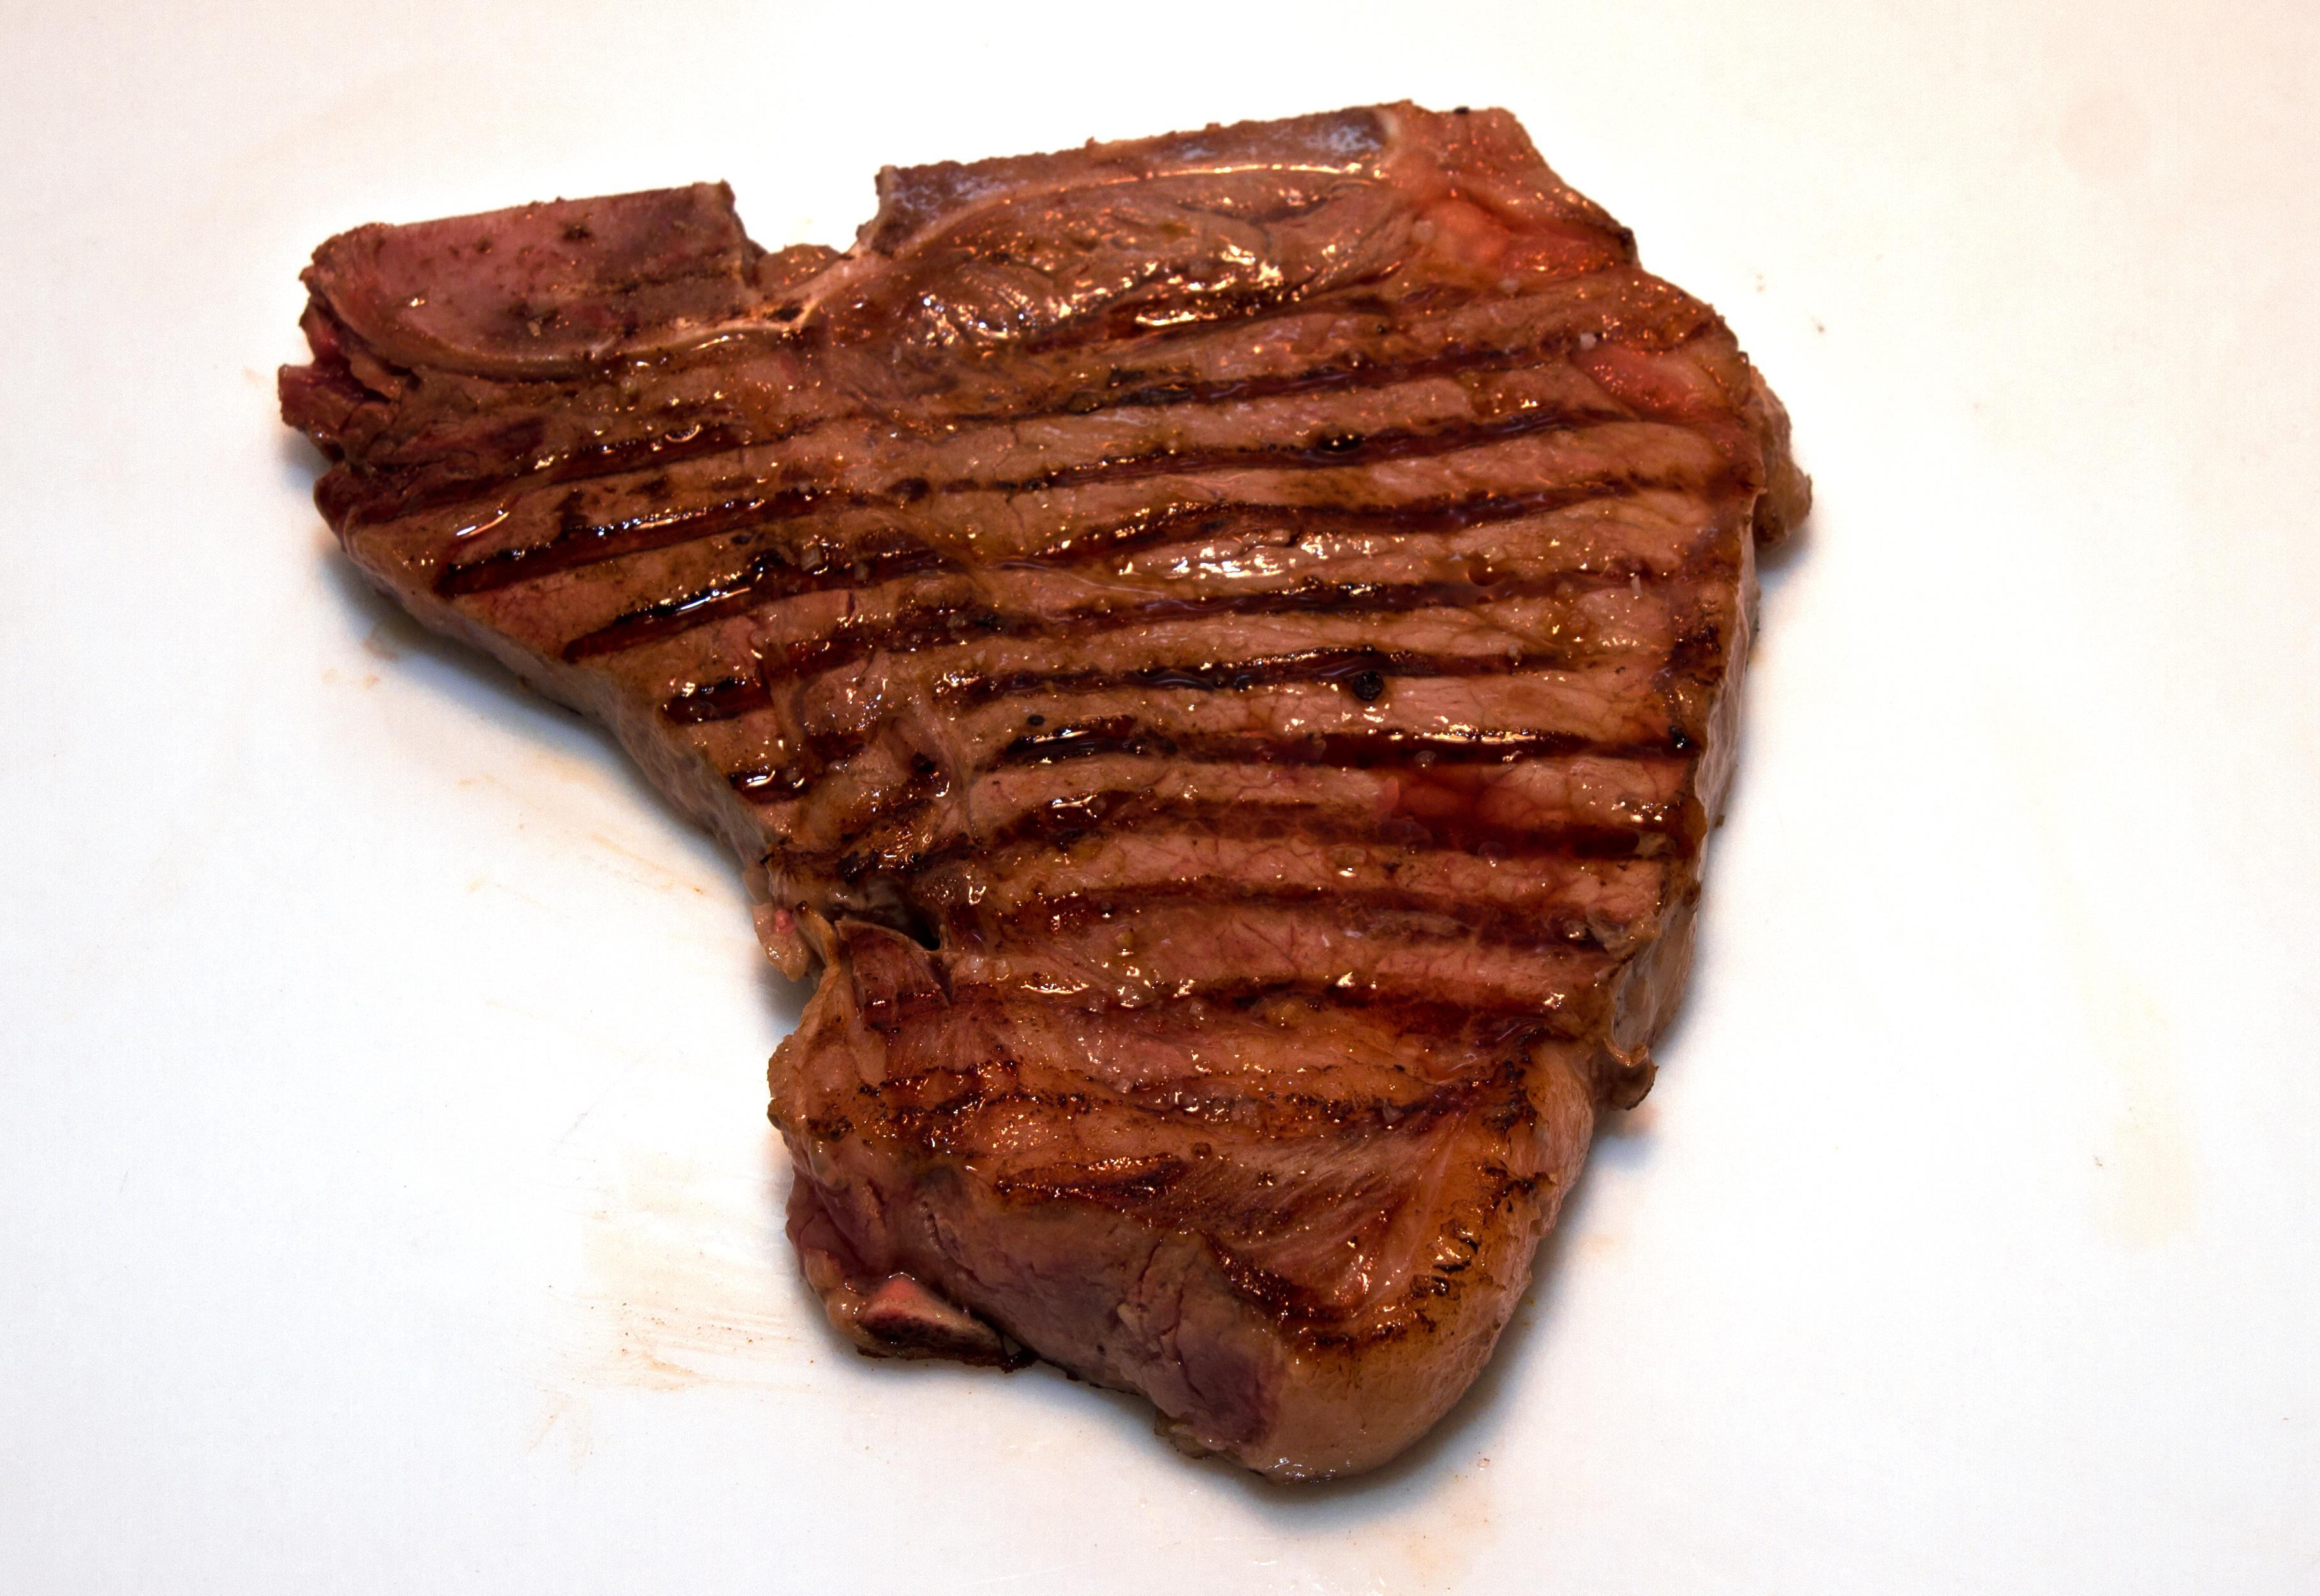 T bone und porterhouse steak besondere steakarten for Porterhouse steak vs t bone